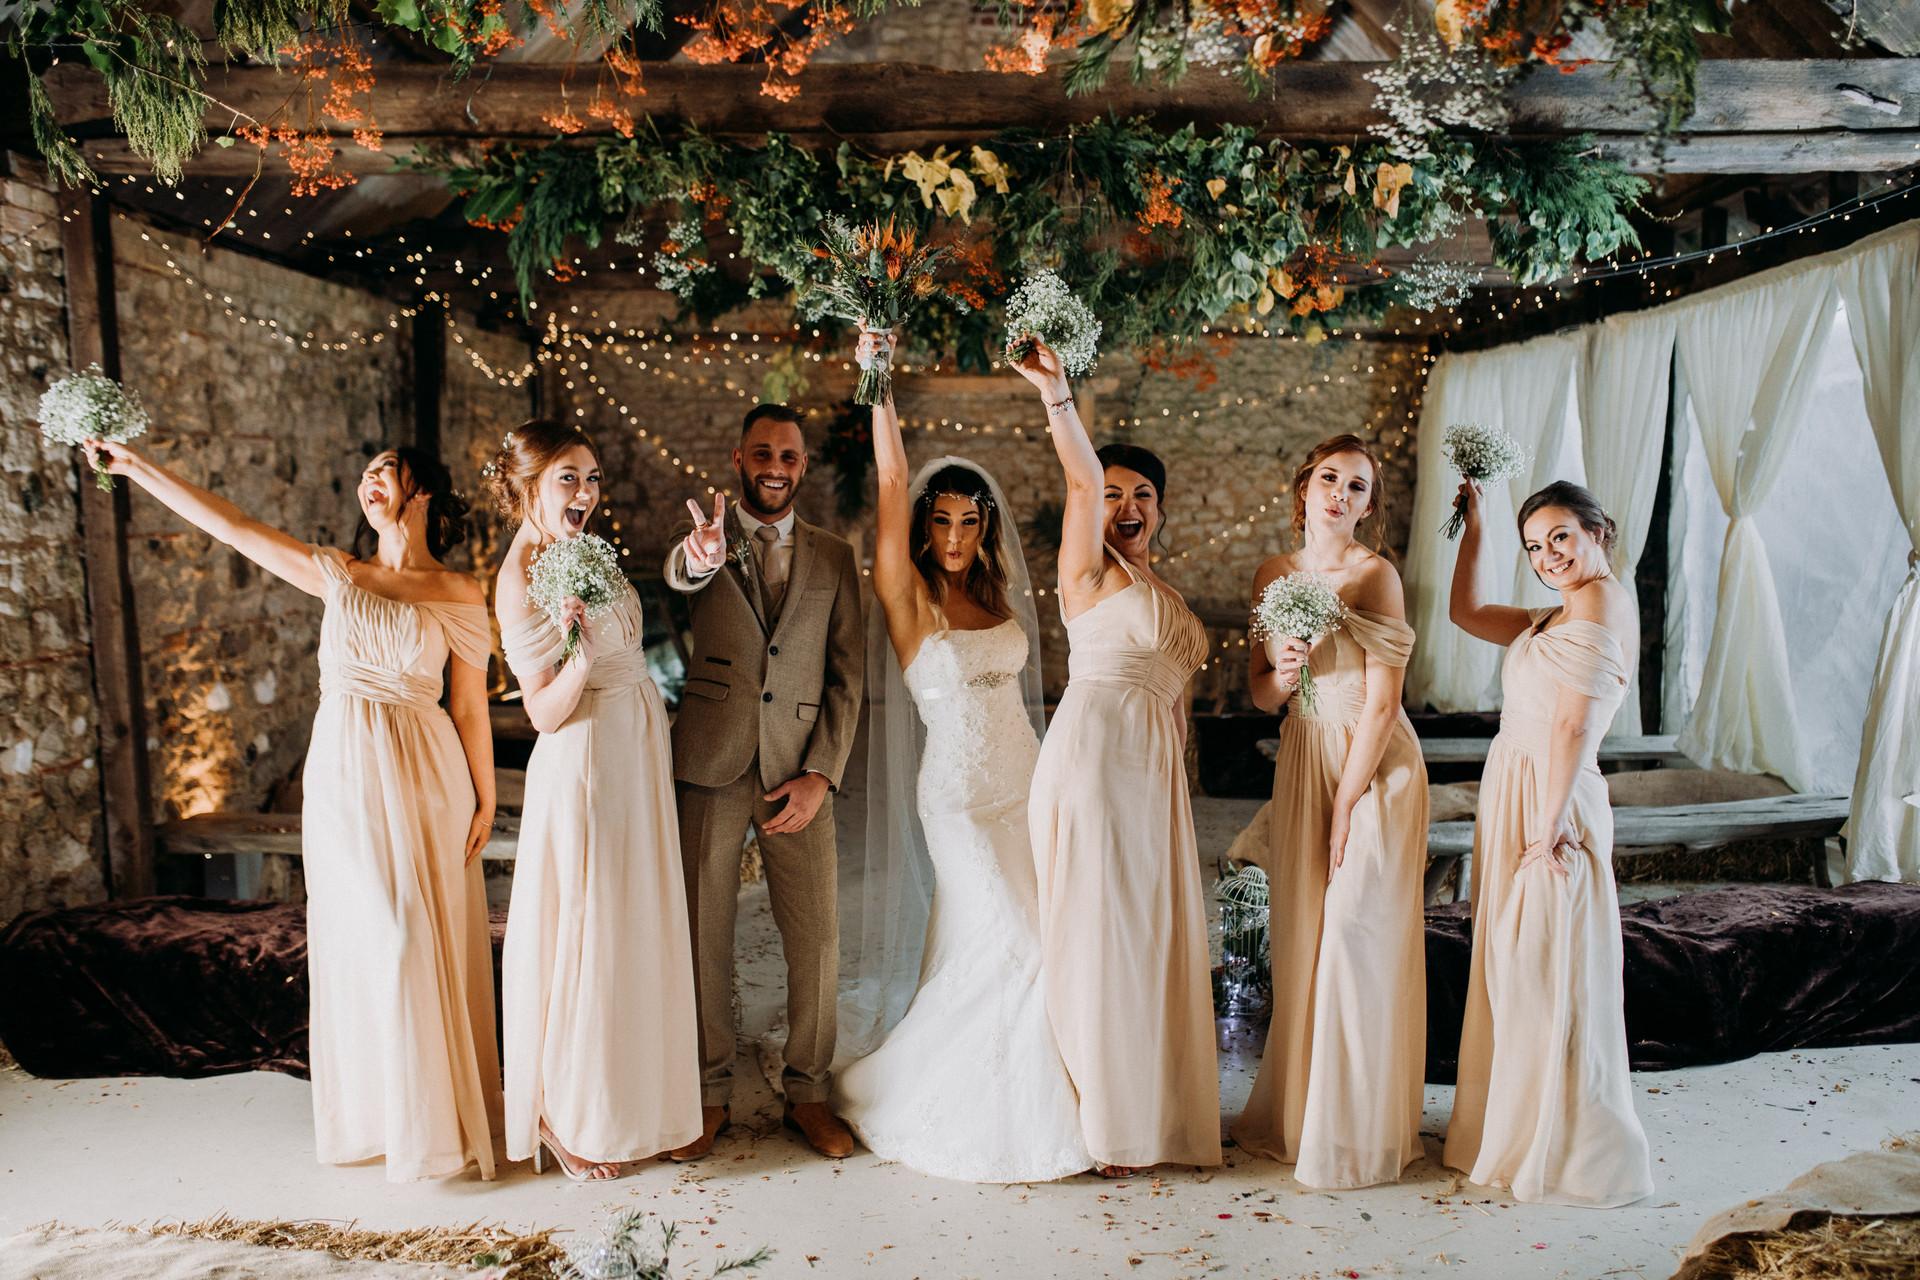 East Afton Farmhouse Wedding Isle of Wight